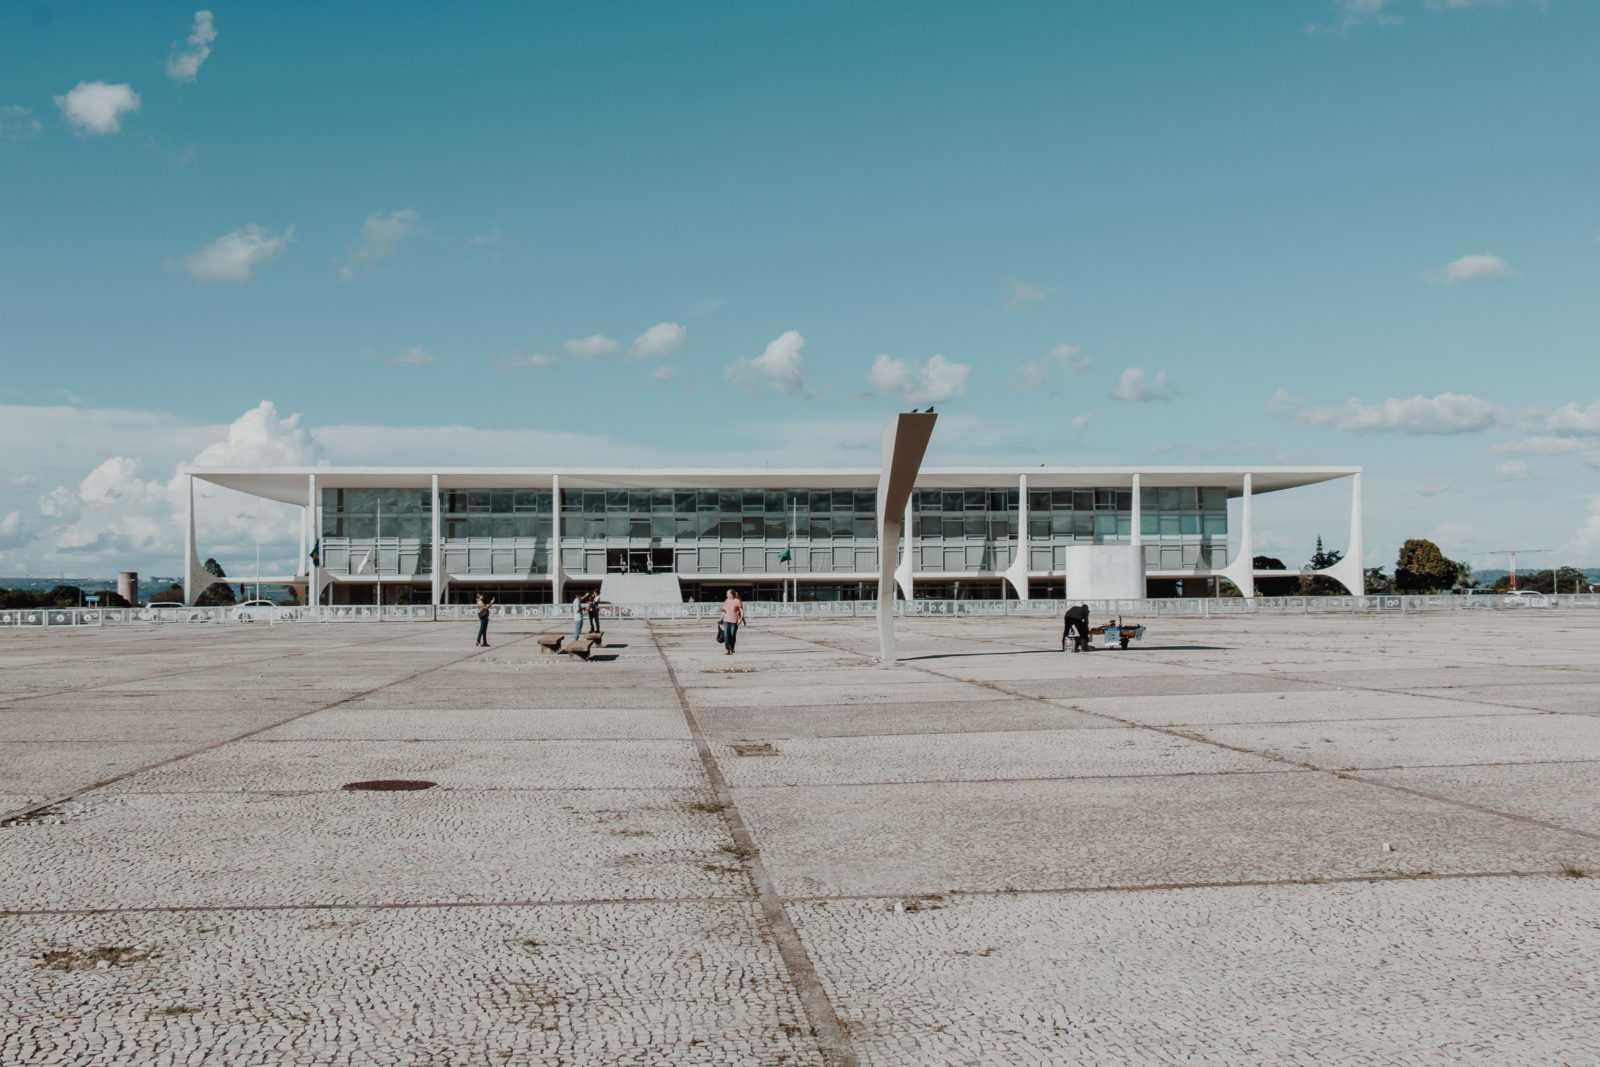 Brasilia Sehenswürdigkeiten Palacio da Alvorada Präsidentenpalast